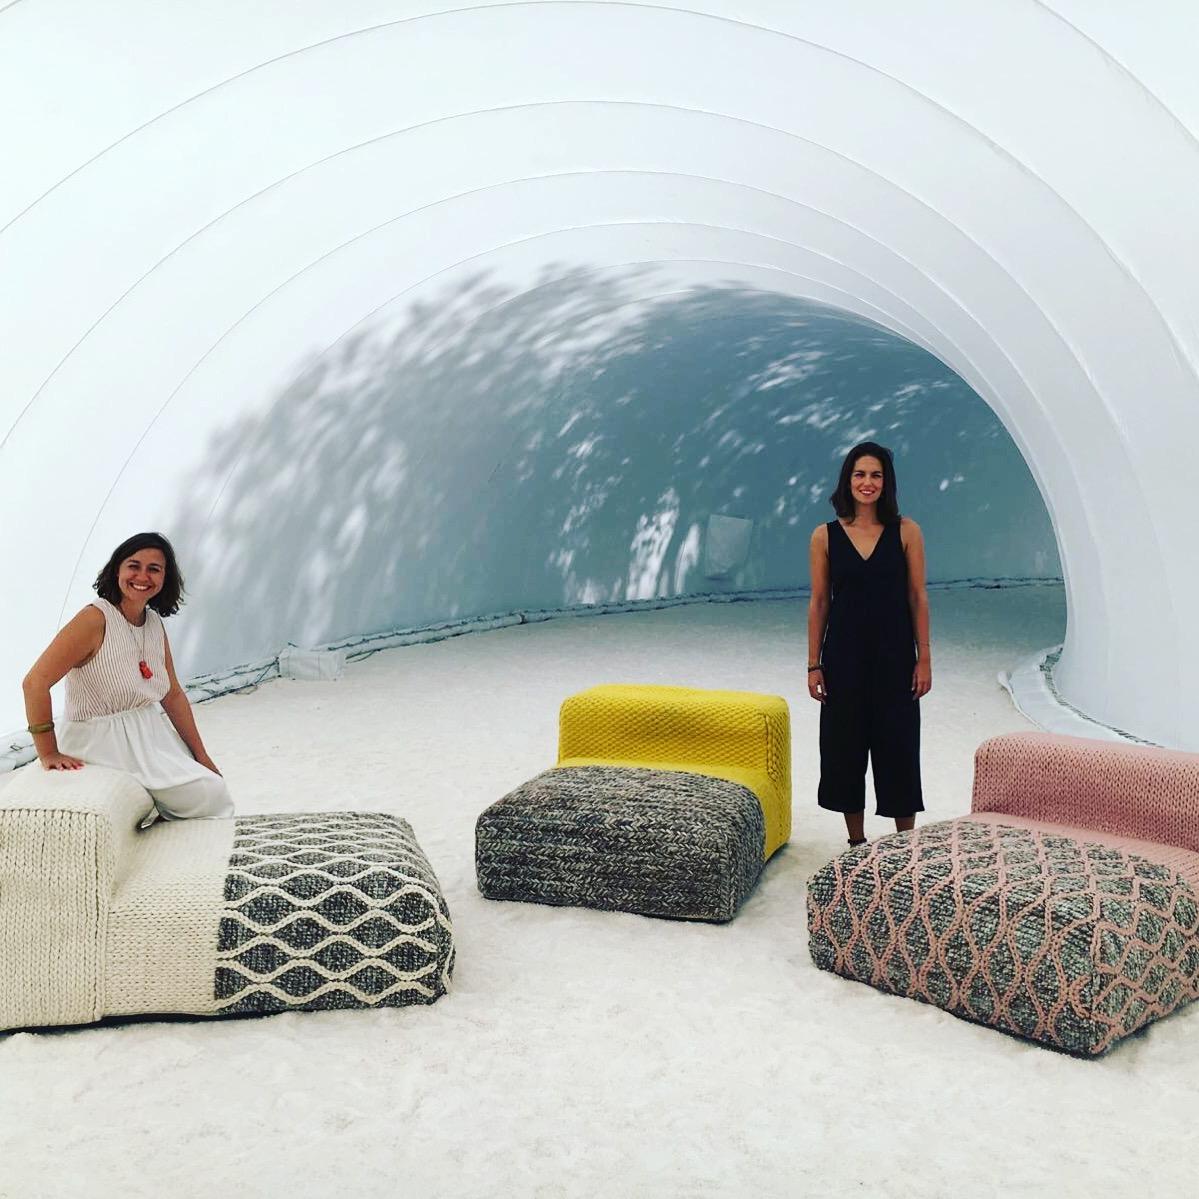 Inma and Anastasia inside LANUBE